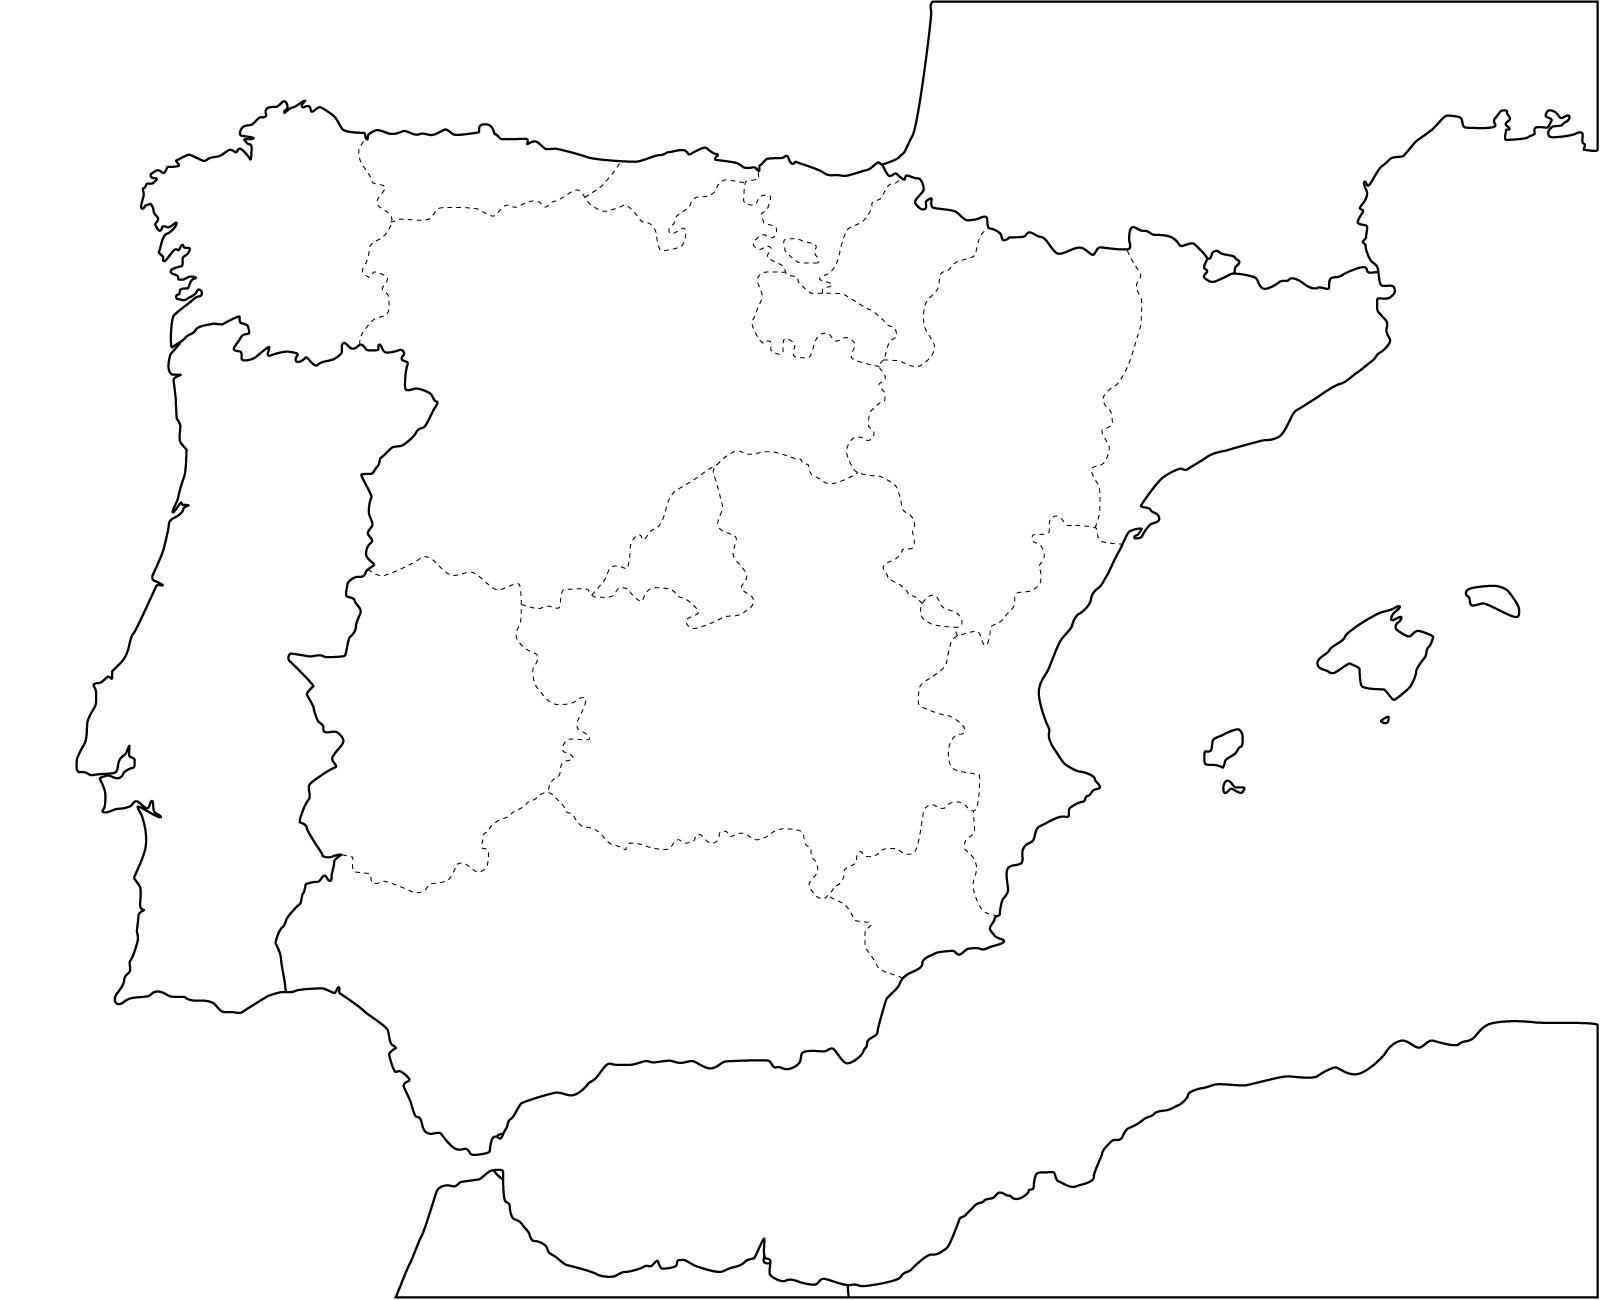 Slepa Mapa Spanelska Prosty Mapa Spanelsko Jizni Evropa Evropa